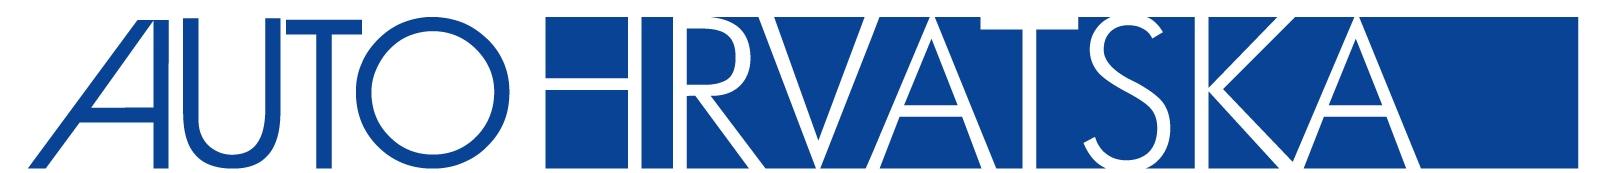 Auto Hrvatska logo